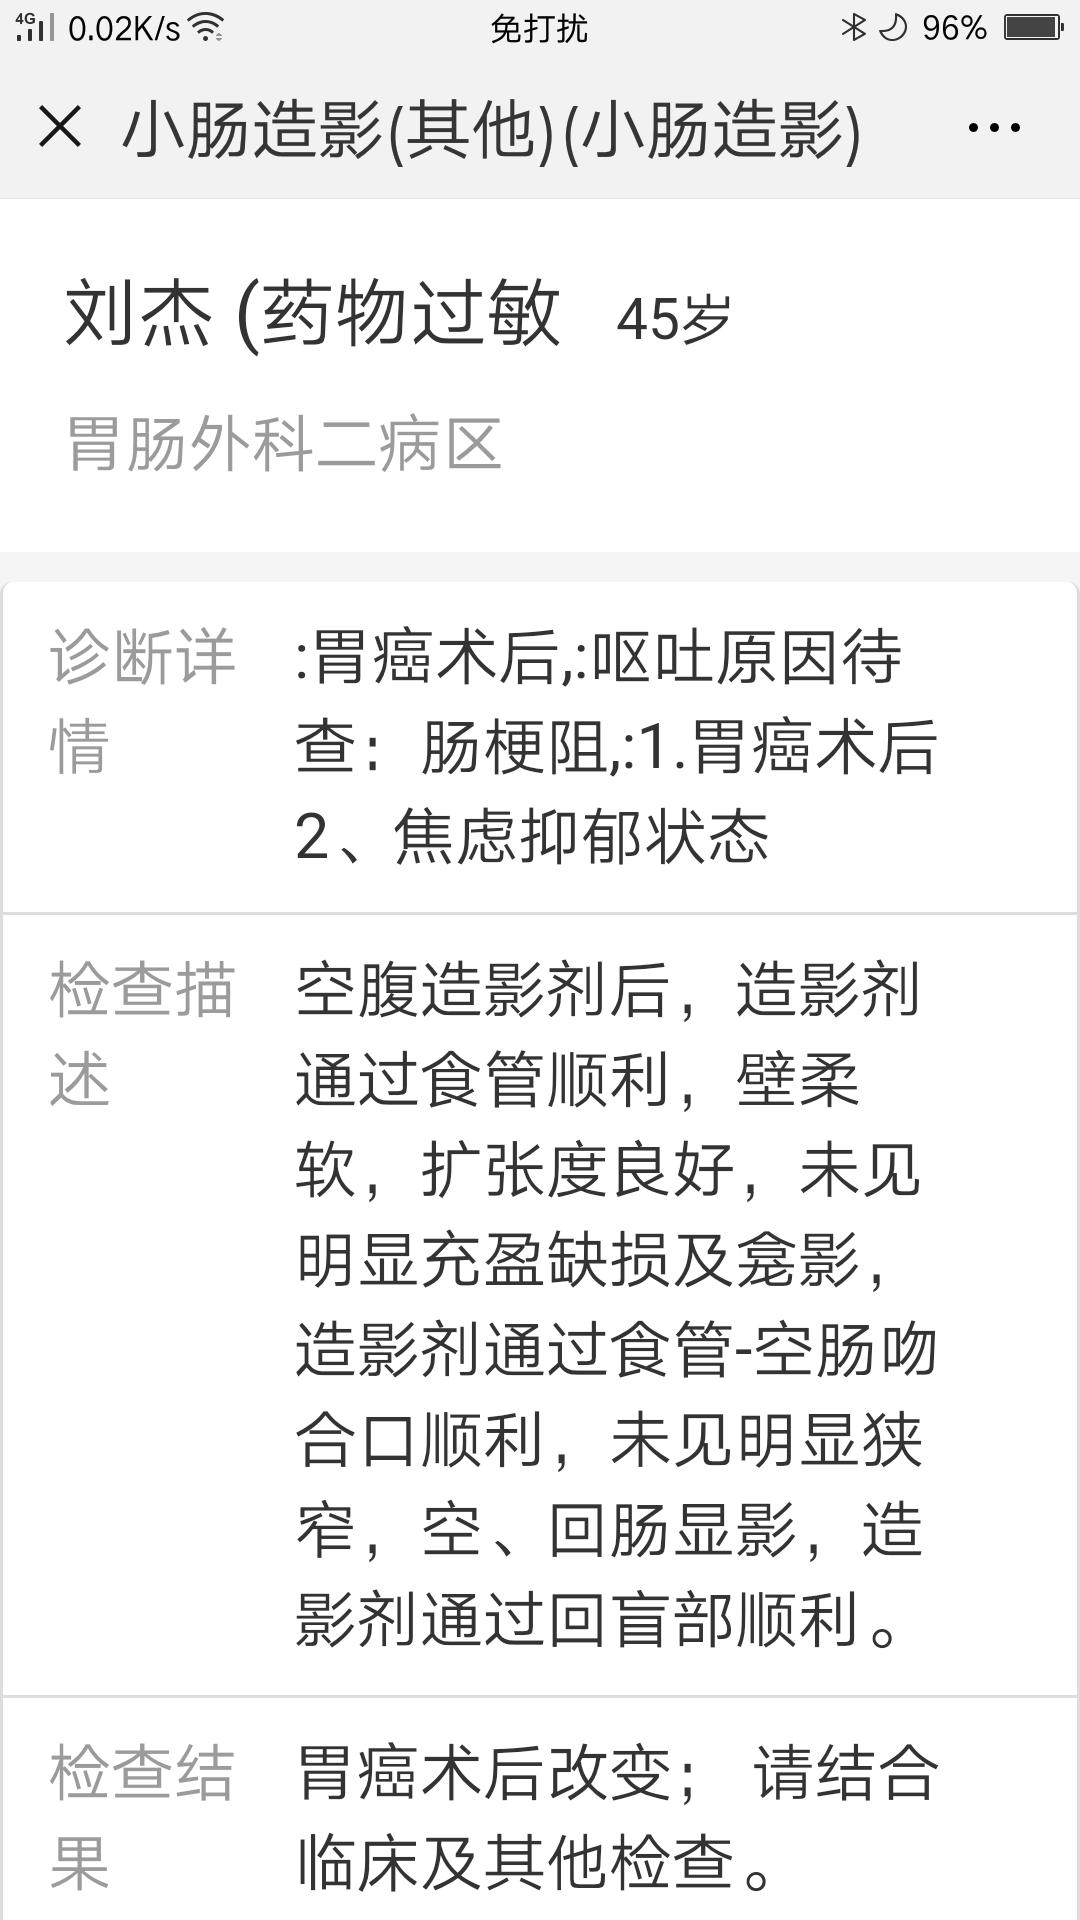 Screenshot_2018-07-09-10-10-46-36.png